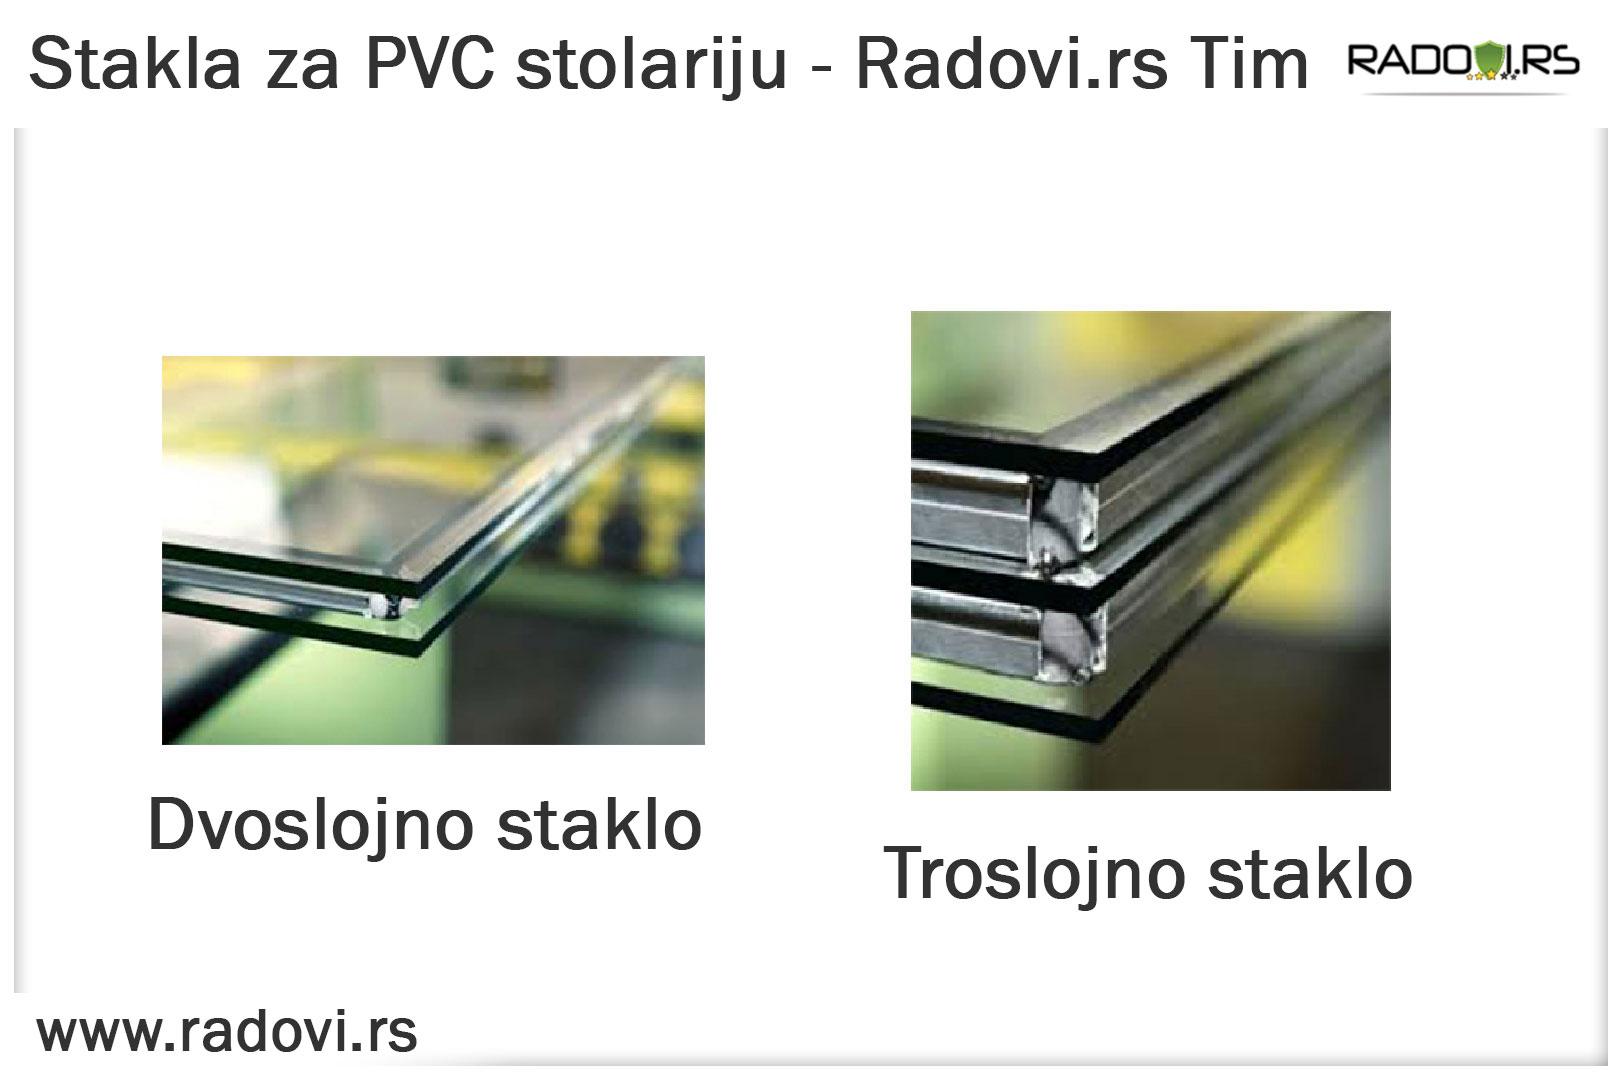 Staklo za PVC stolariju - PVC stolarija Tim - Radovi.rs